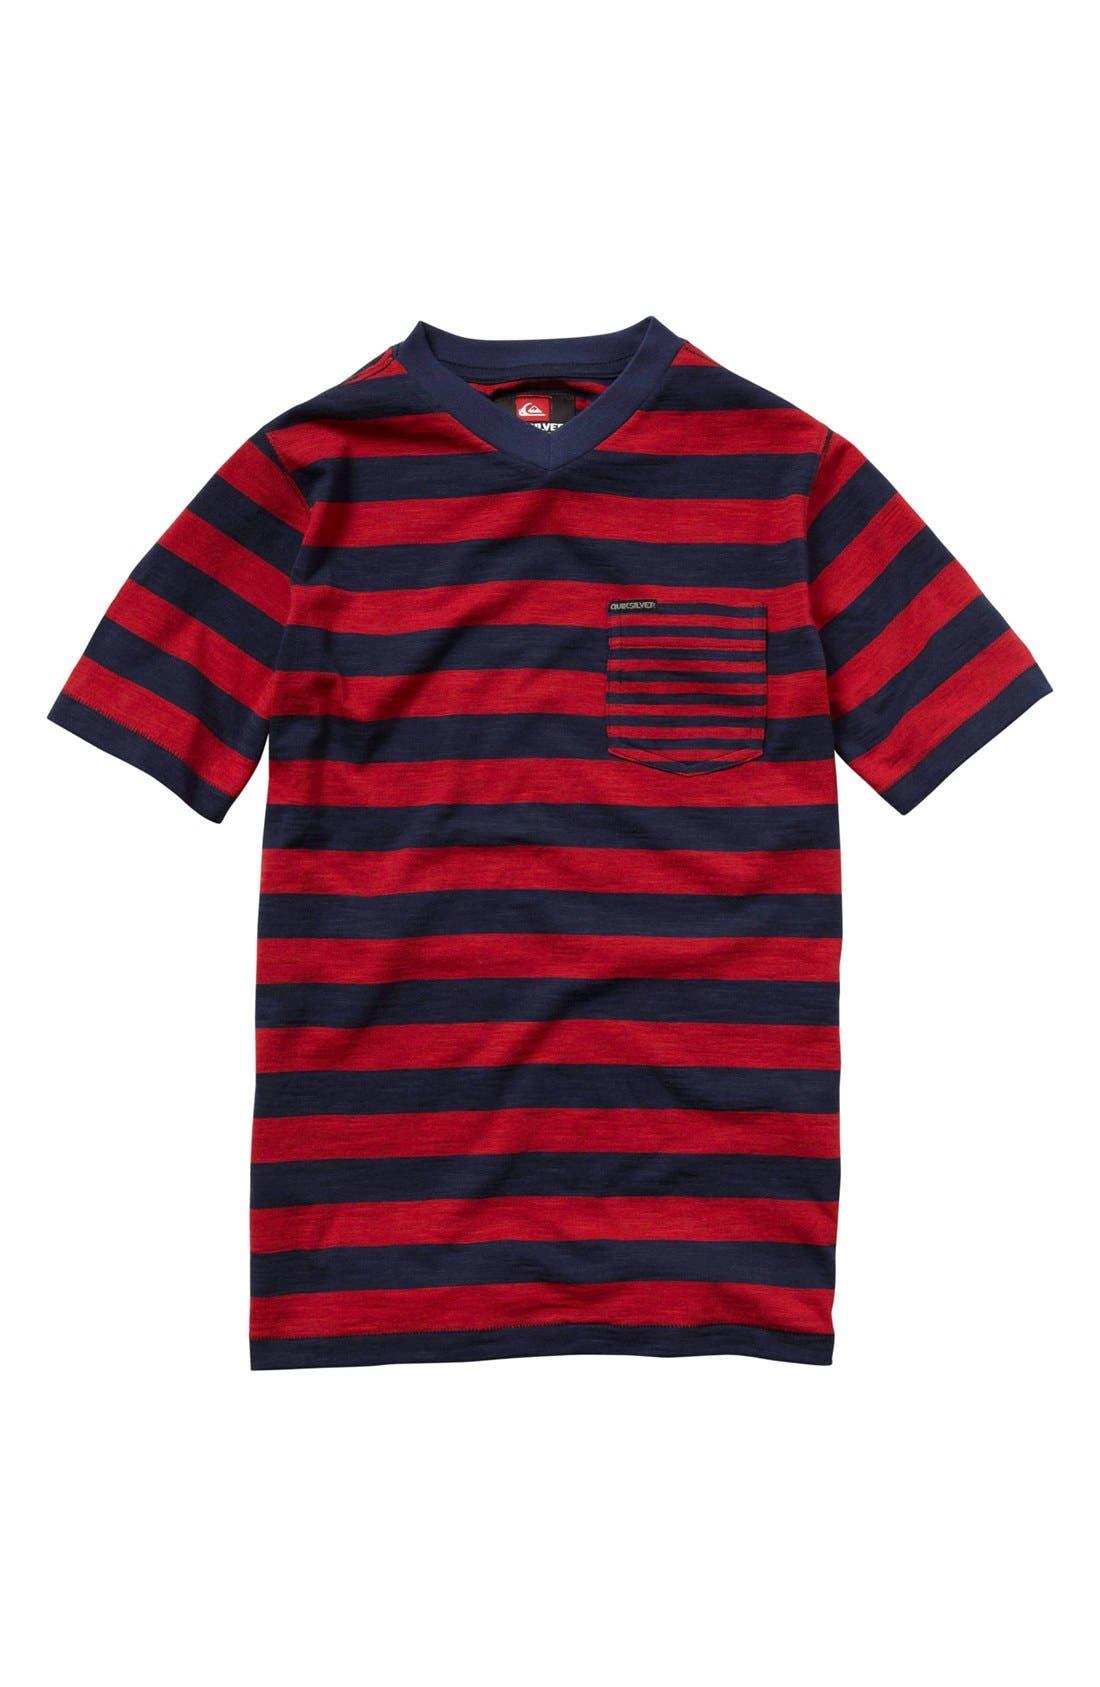 Alternate Image 1 Selected - Quiksilver 'Brody' T-Shirt (Big Boys)